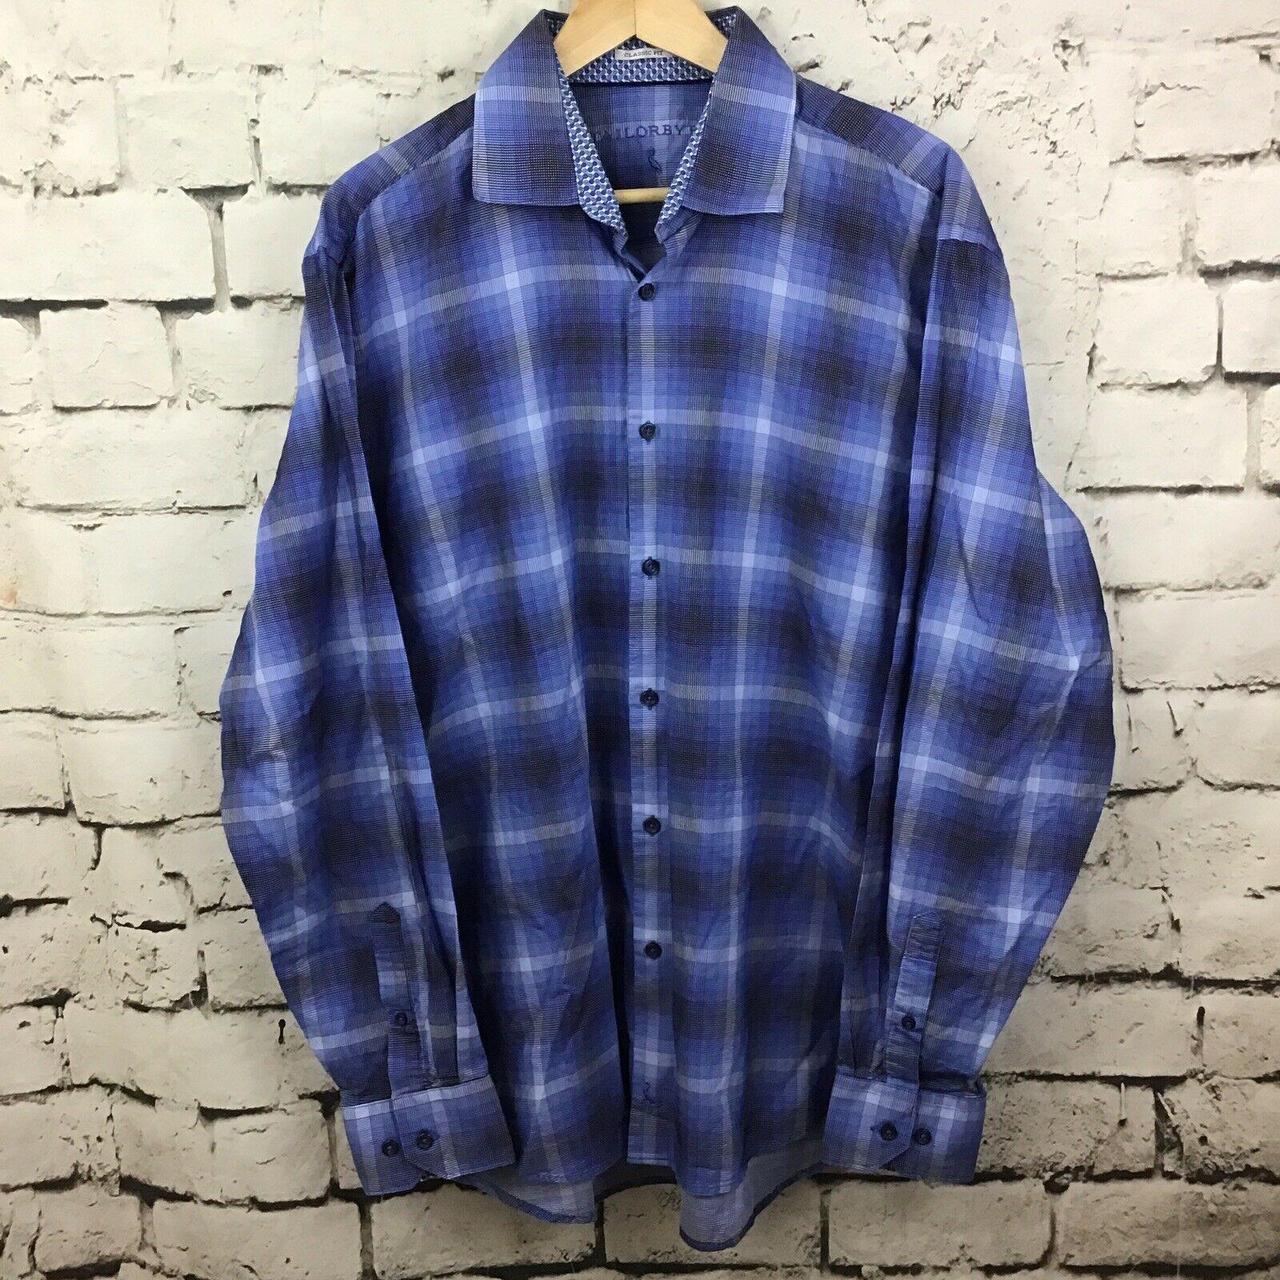 Product Image 1 - Taylorbyrd Mens Blue Plaid Dress